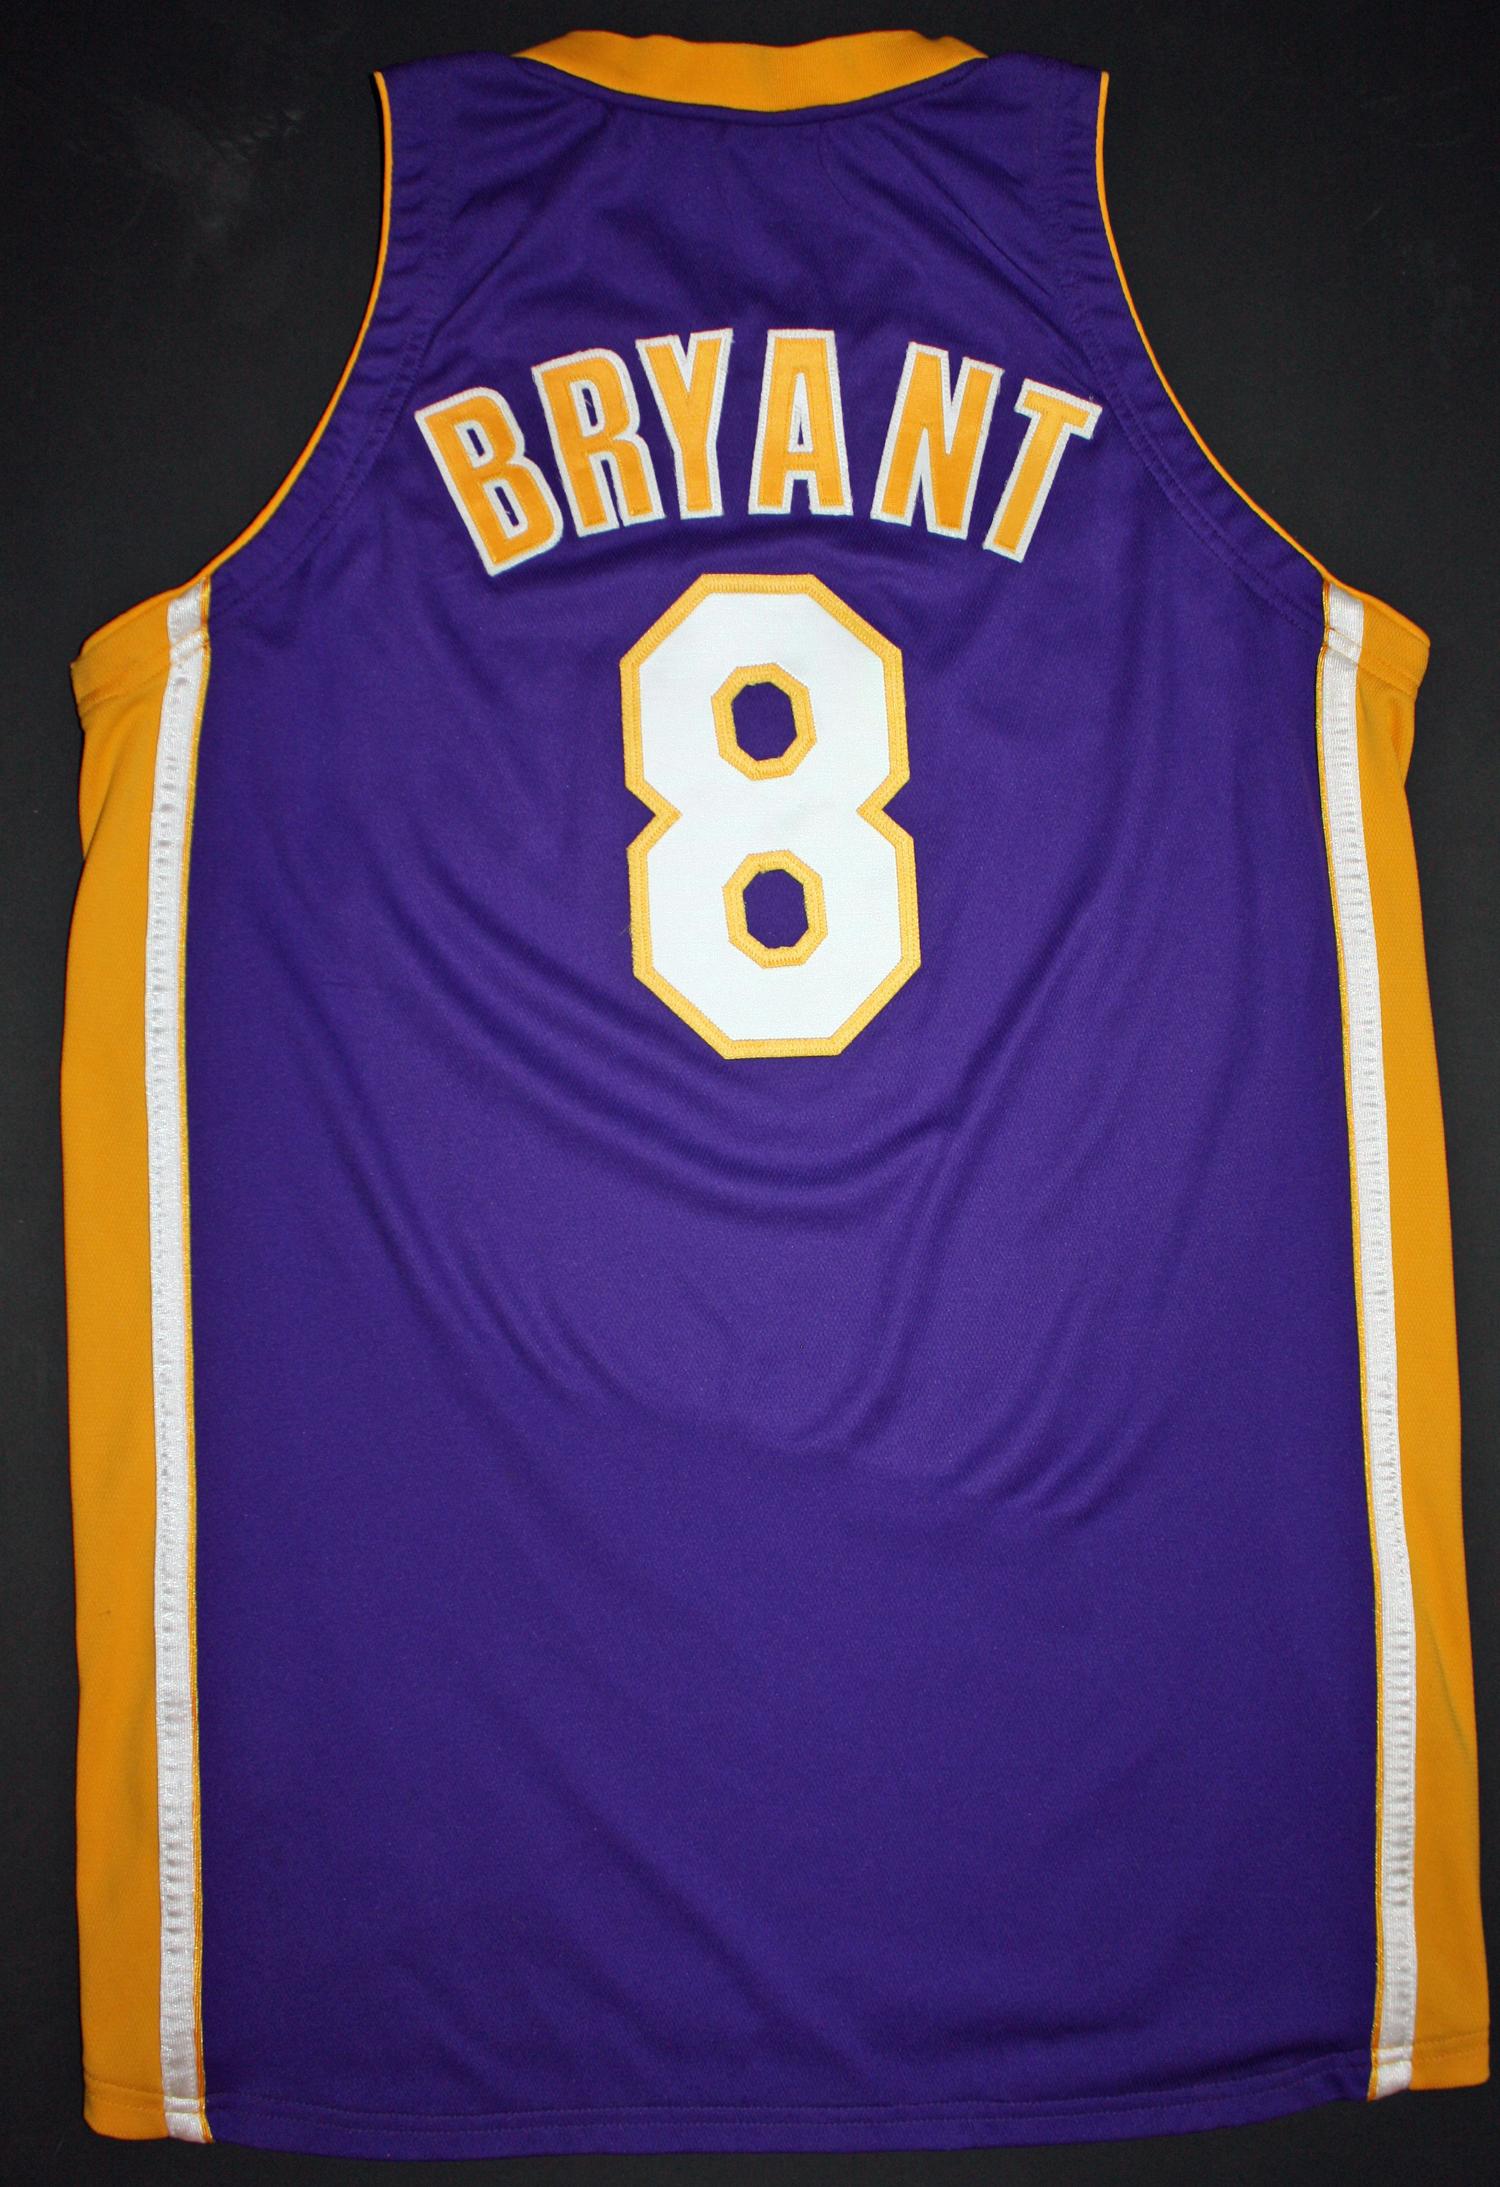 82b82185003 ... 1999-2000 Kobe Bryant Game Worn   Signed NBA Finals Jersey (PSA   Grey  ...